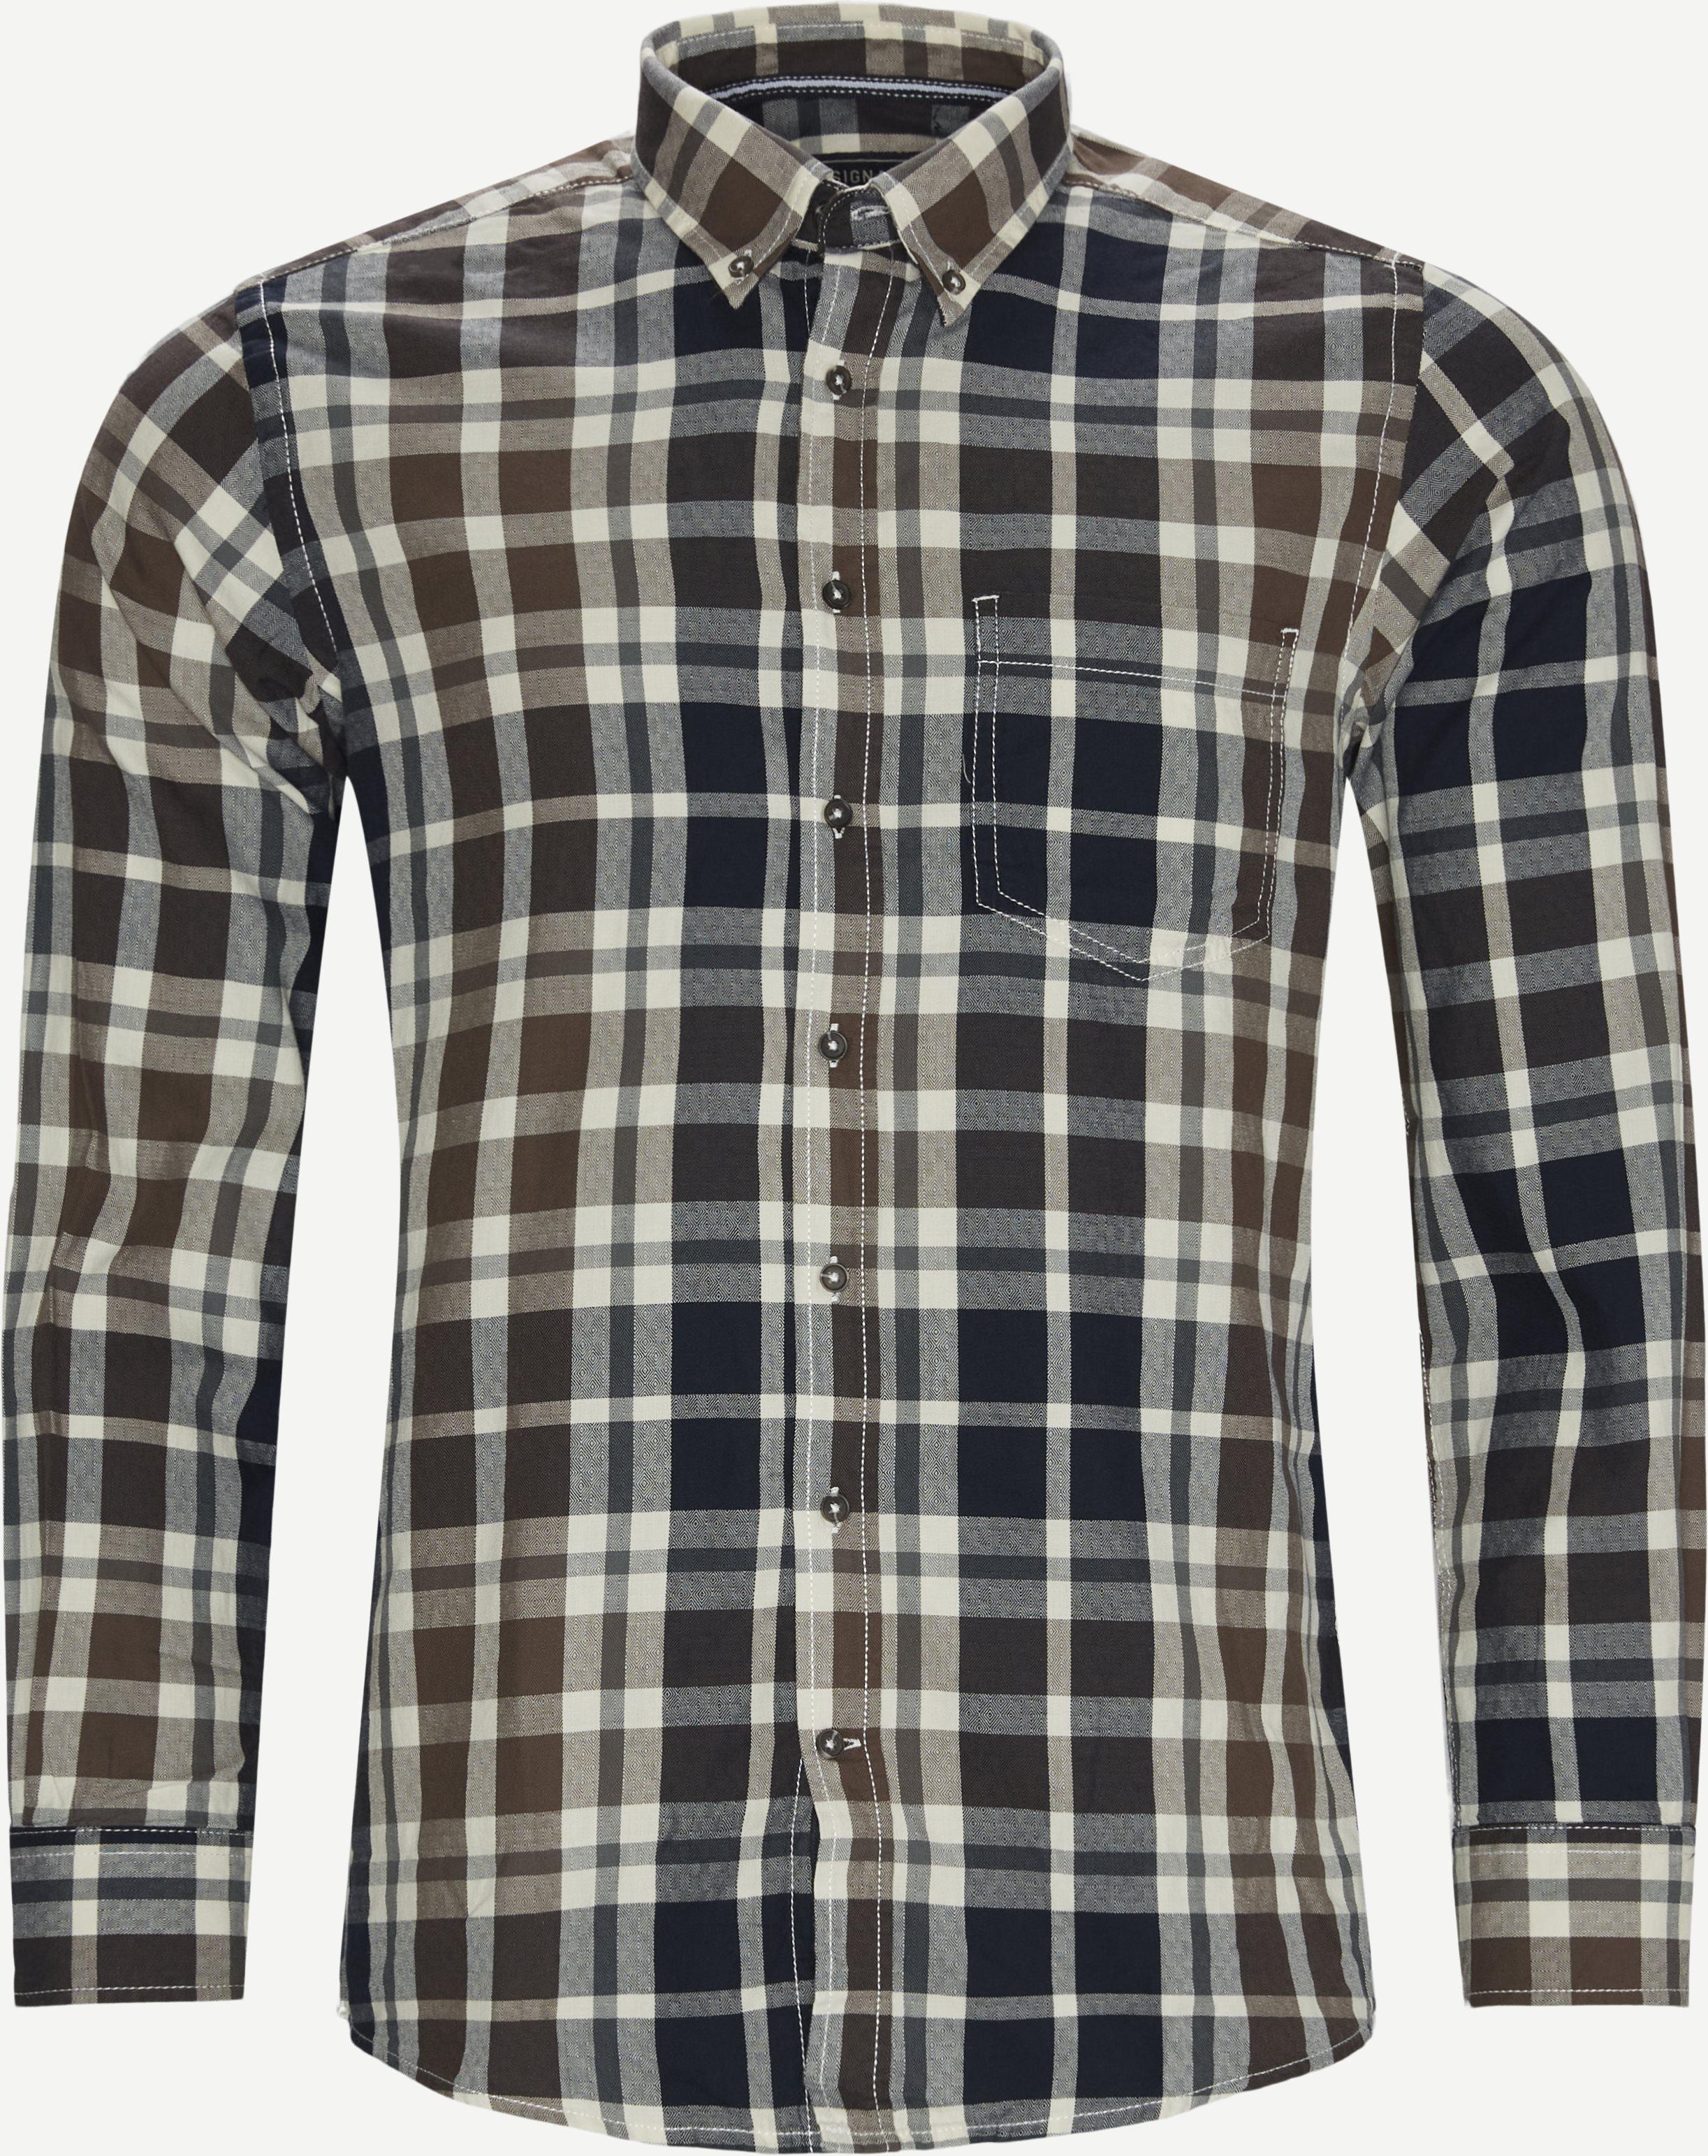 Skjortor - Regular fit - Blå